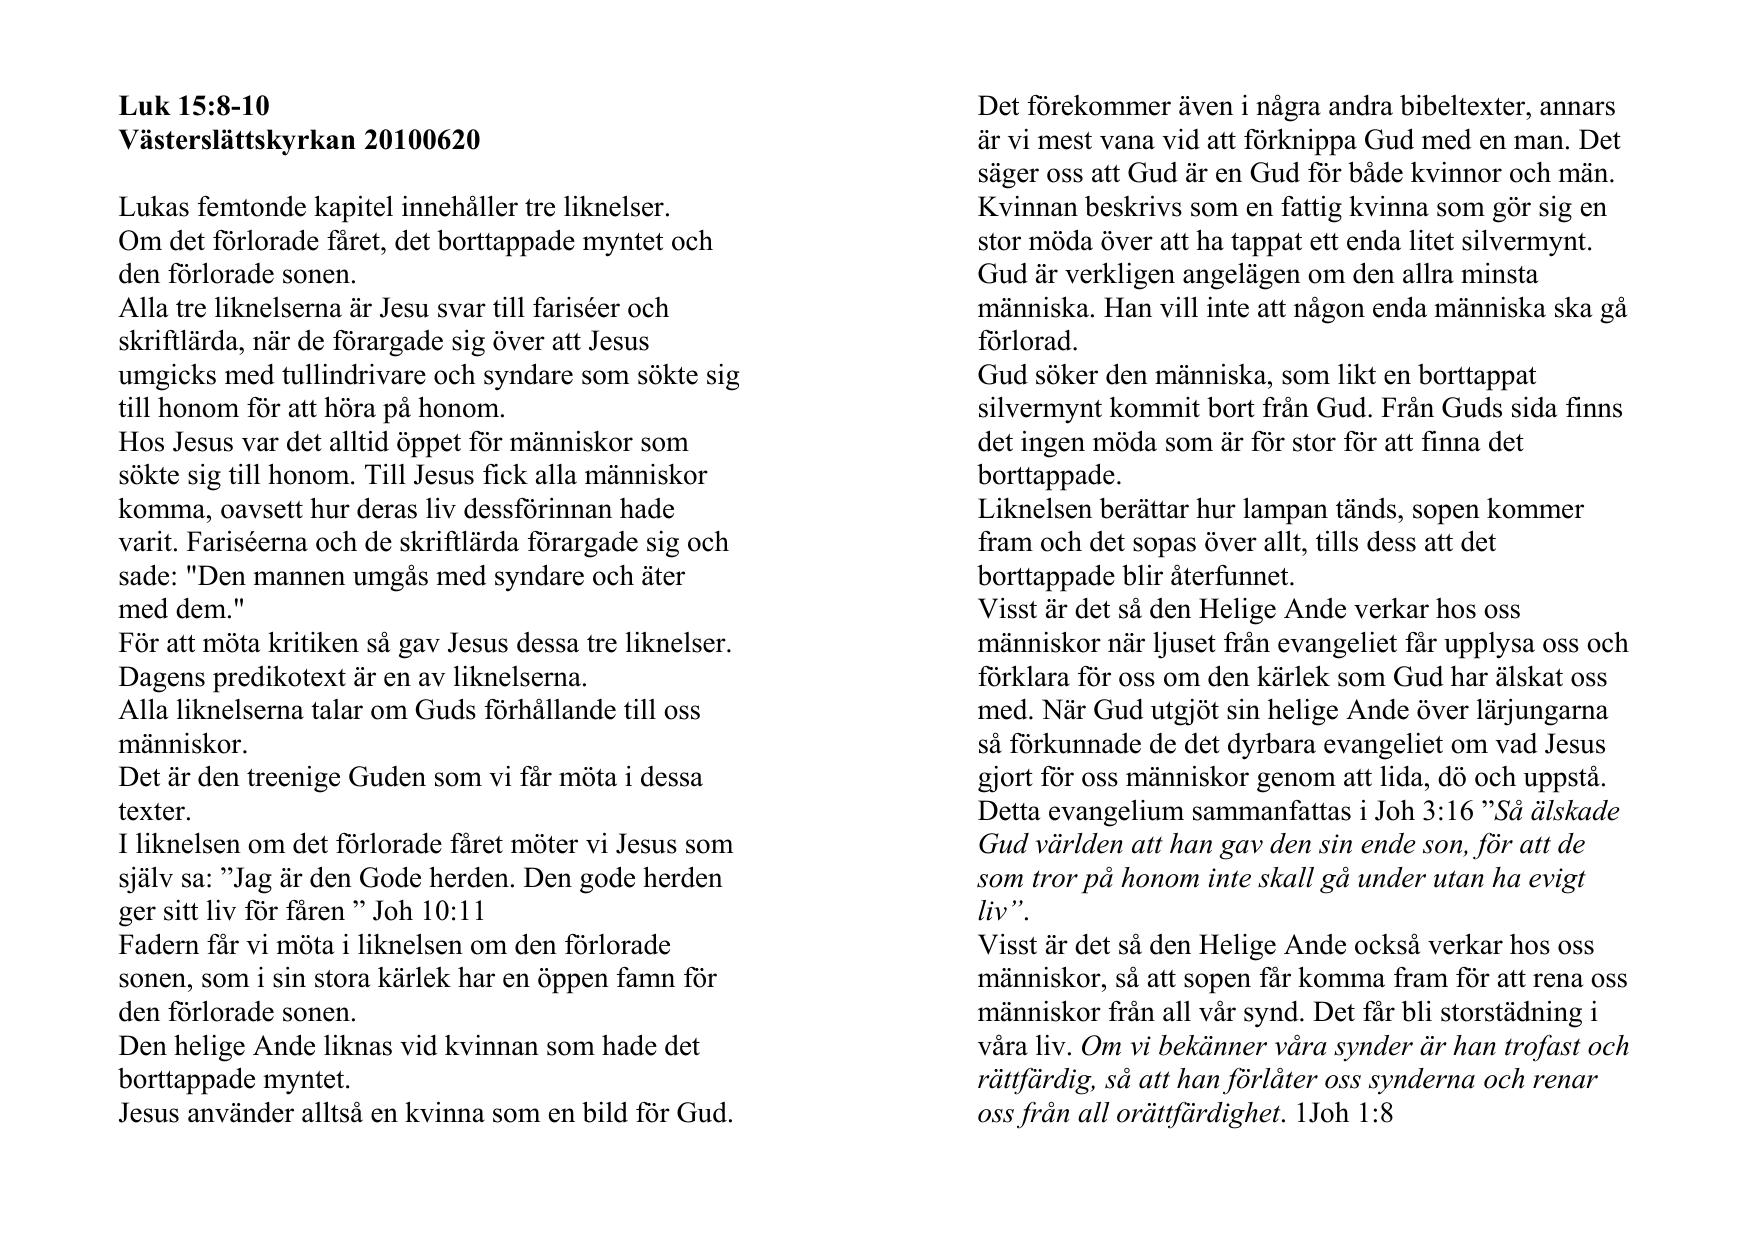 Dalby kyrka - Dalby frsamling - en levande kristen gemenskap!